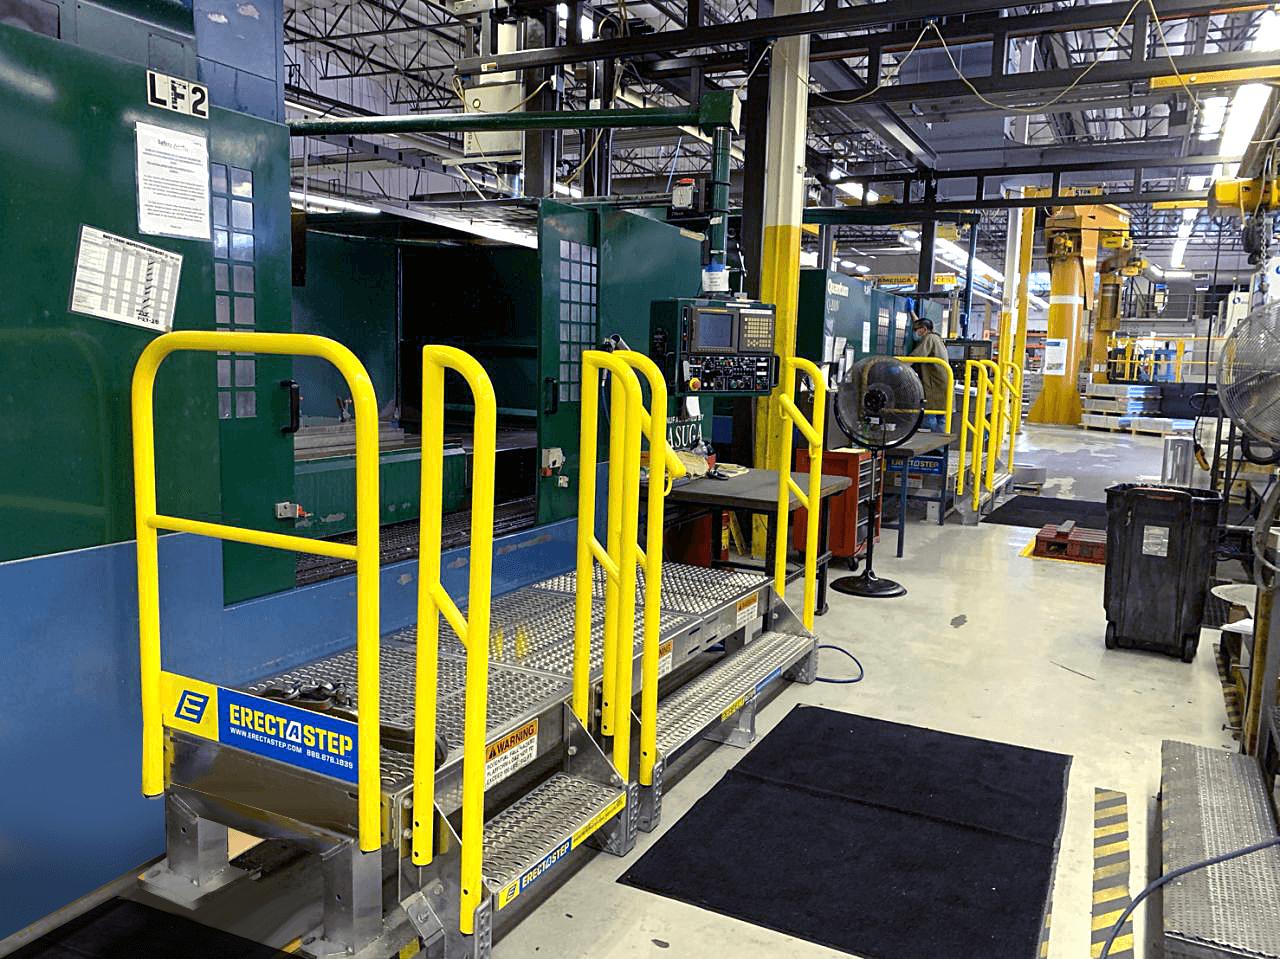 ErectaStep platform stair for a CNC machine